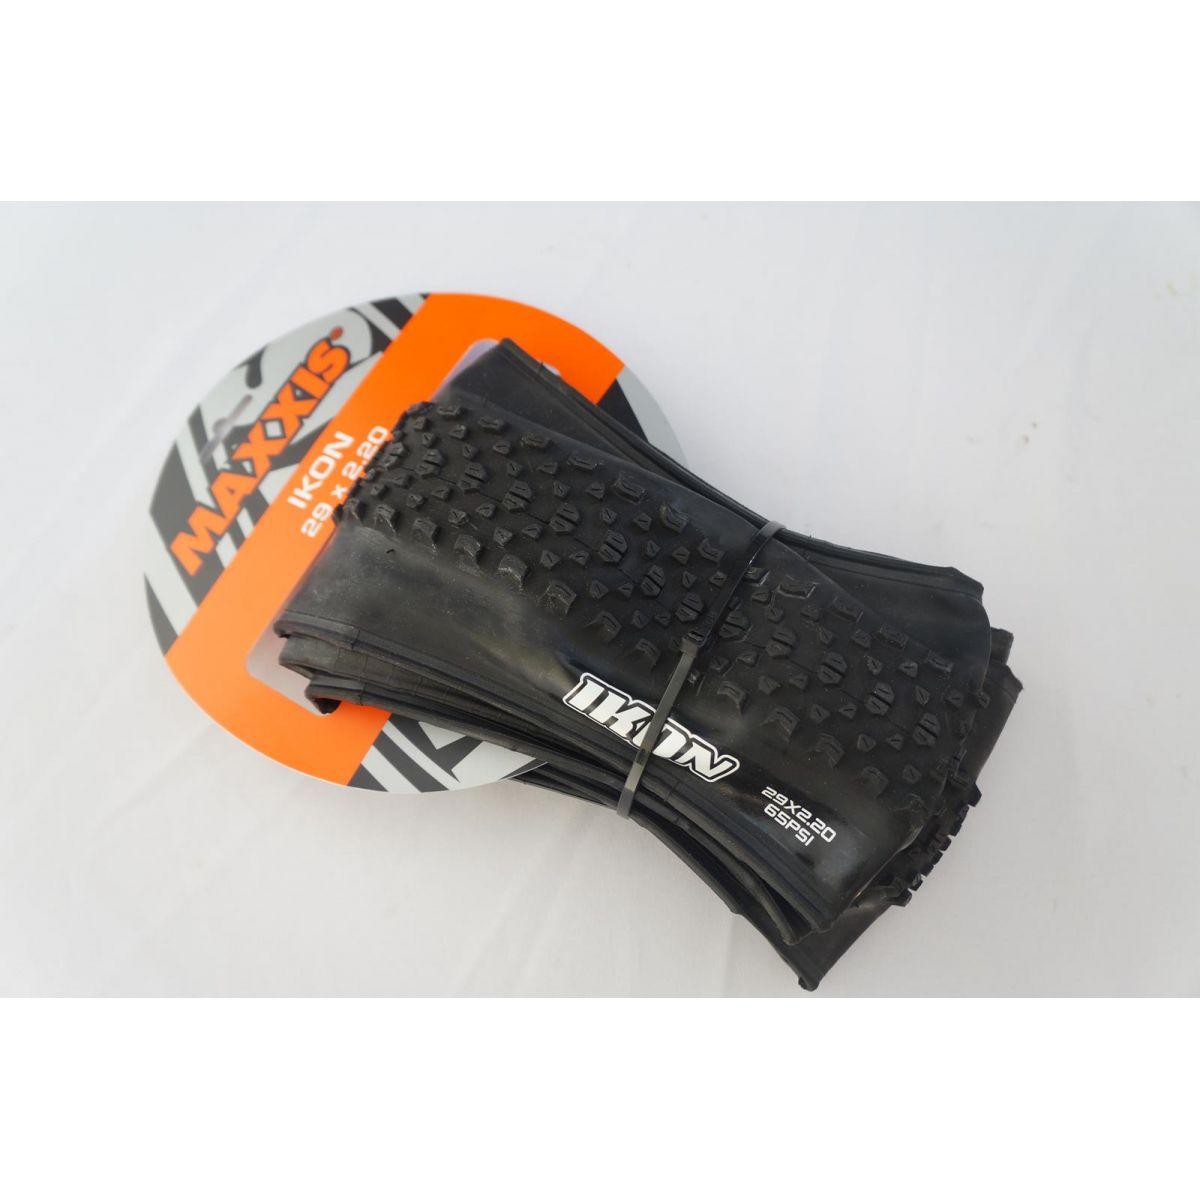 "Pneu Bicicleta MTB Maxxis Ikon XC 29 em Kevlar Dobrável Aro 29 x 2.2"""